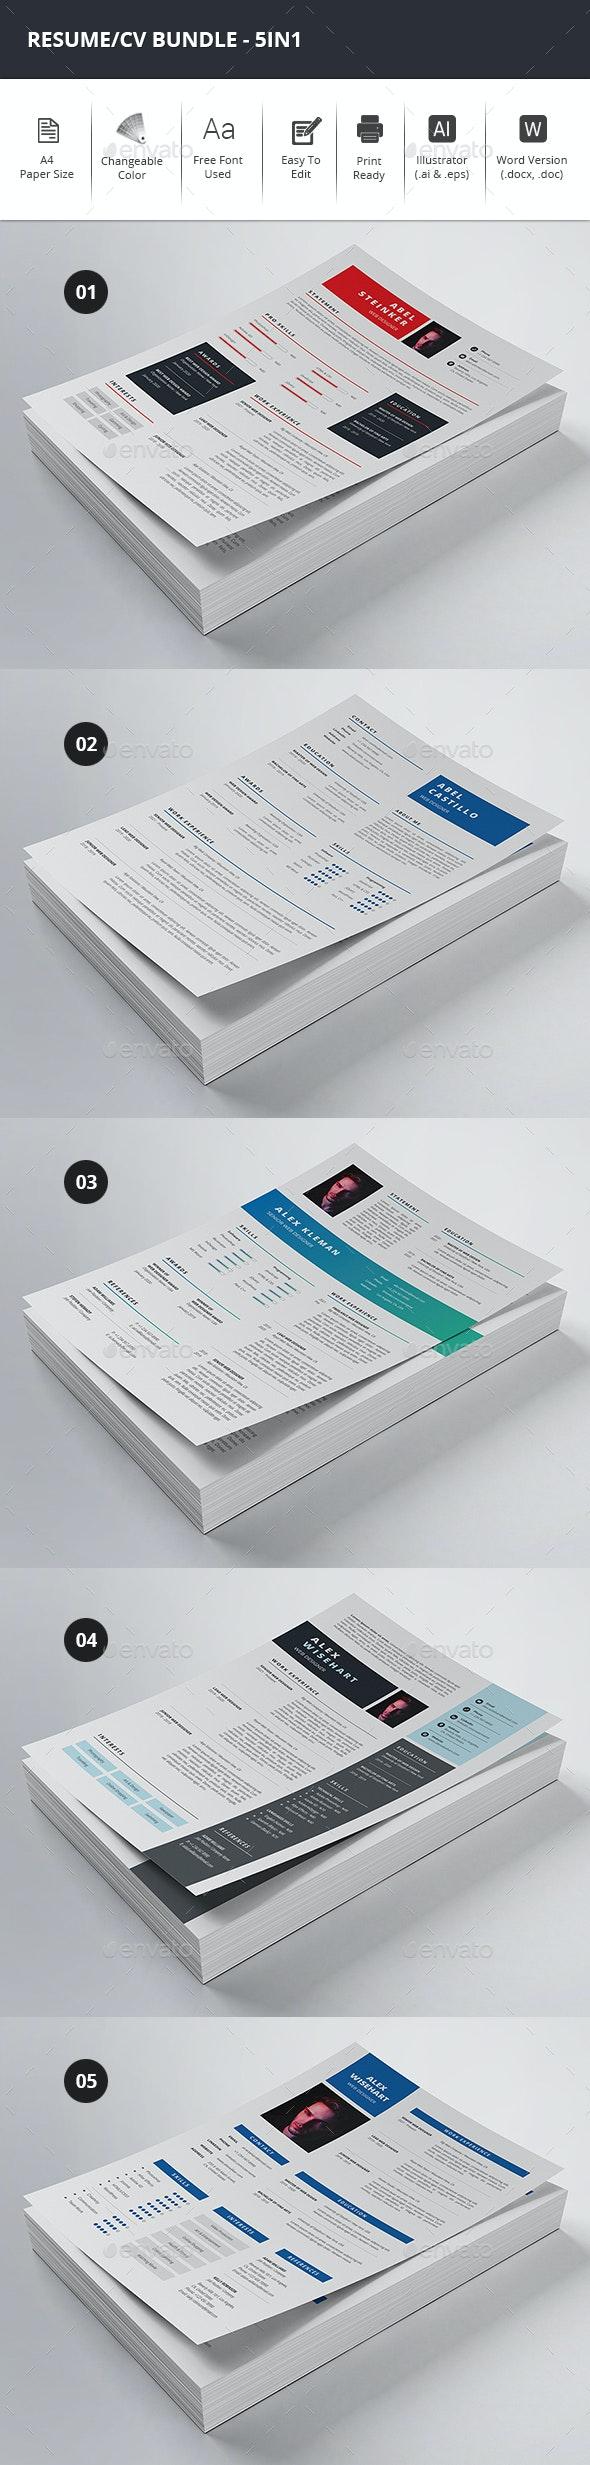 Resume/CV Bundle - 5in1 - Resumes Stationery